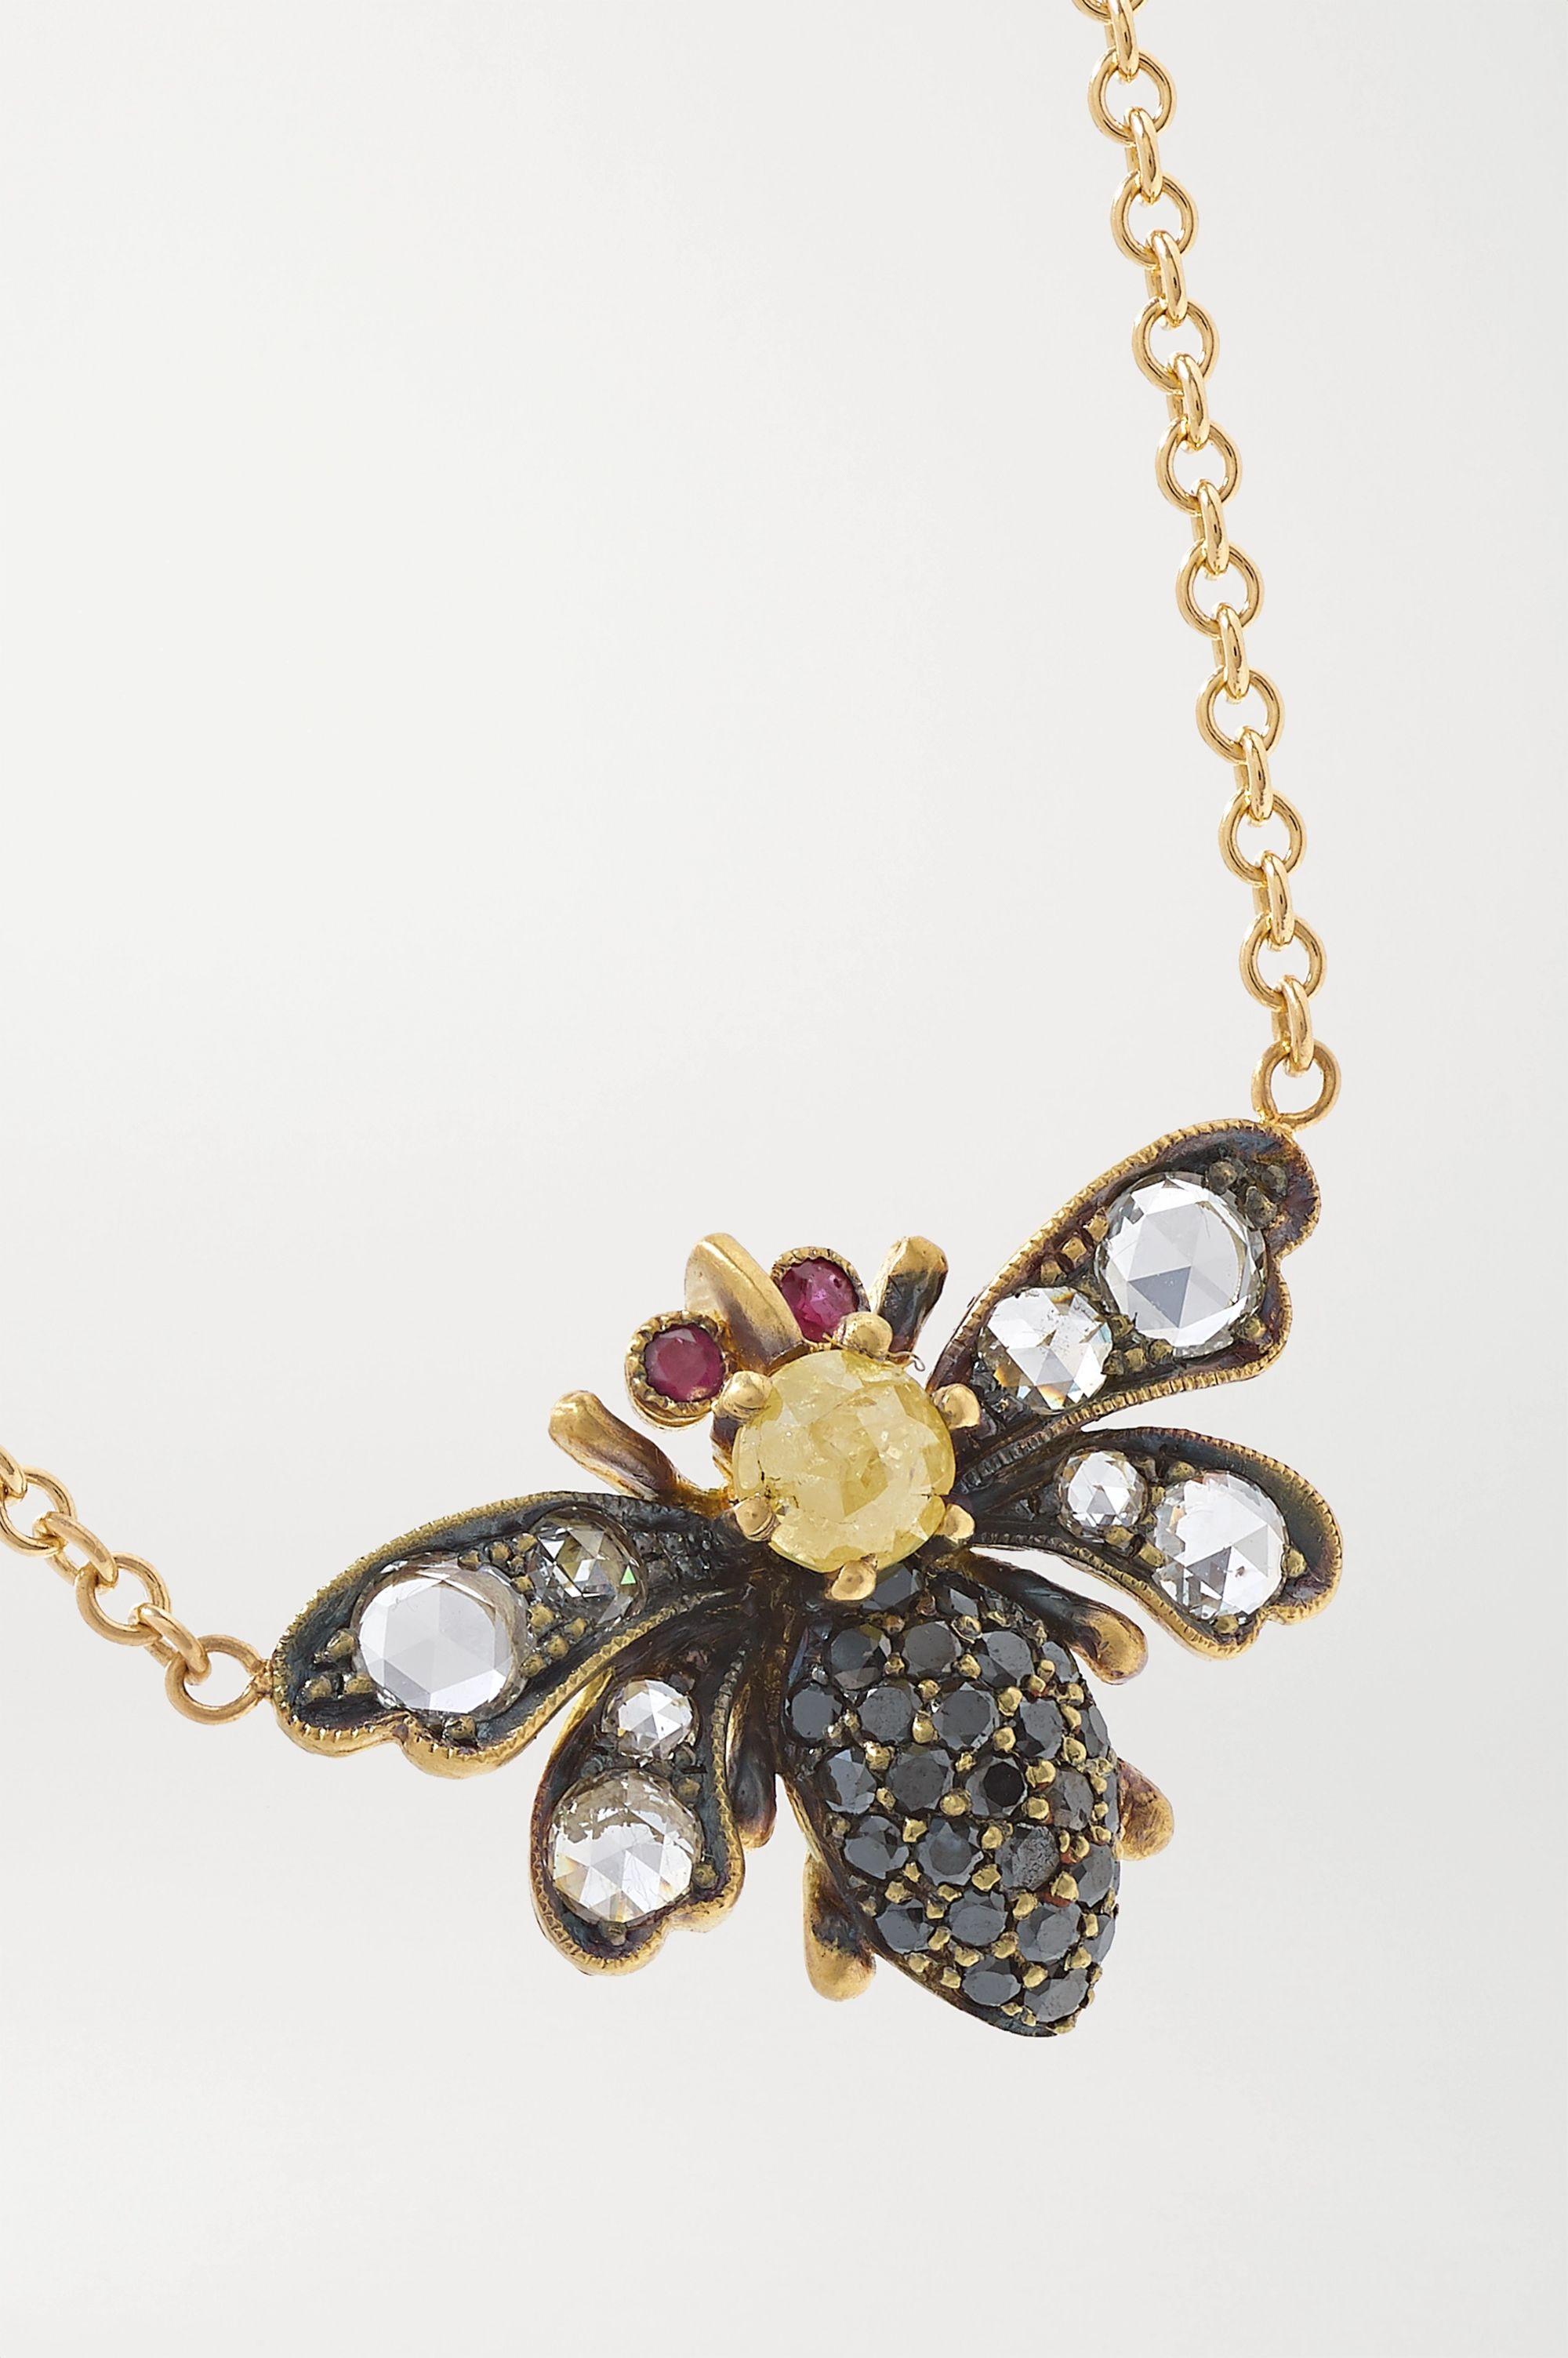 Sylva & Cie 18-karat gold, diamond and ruby necklace